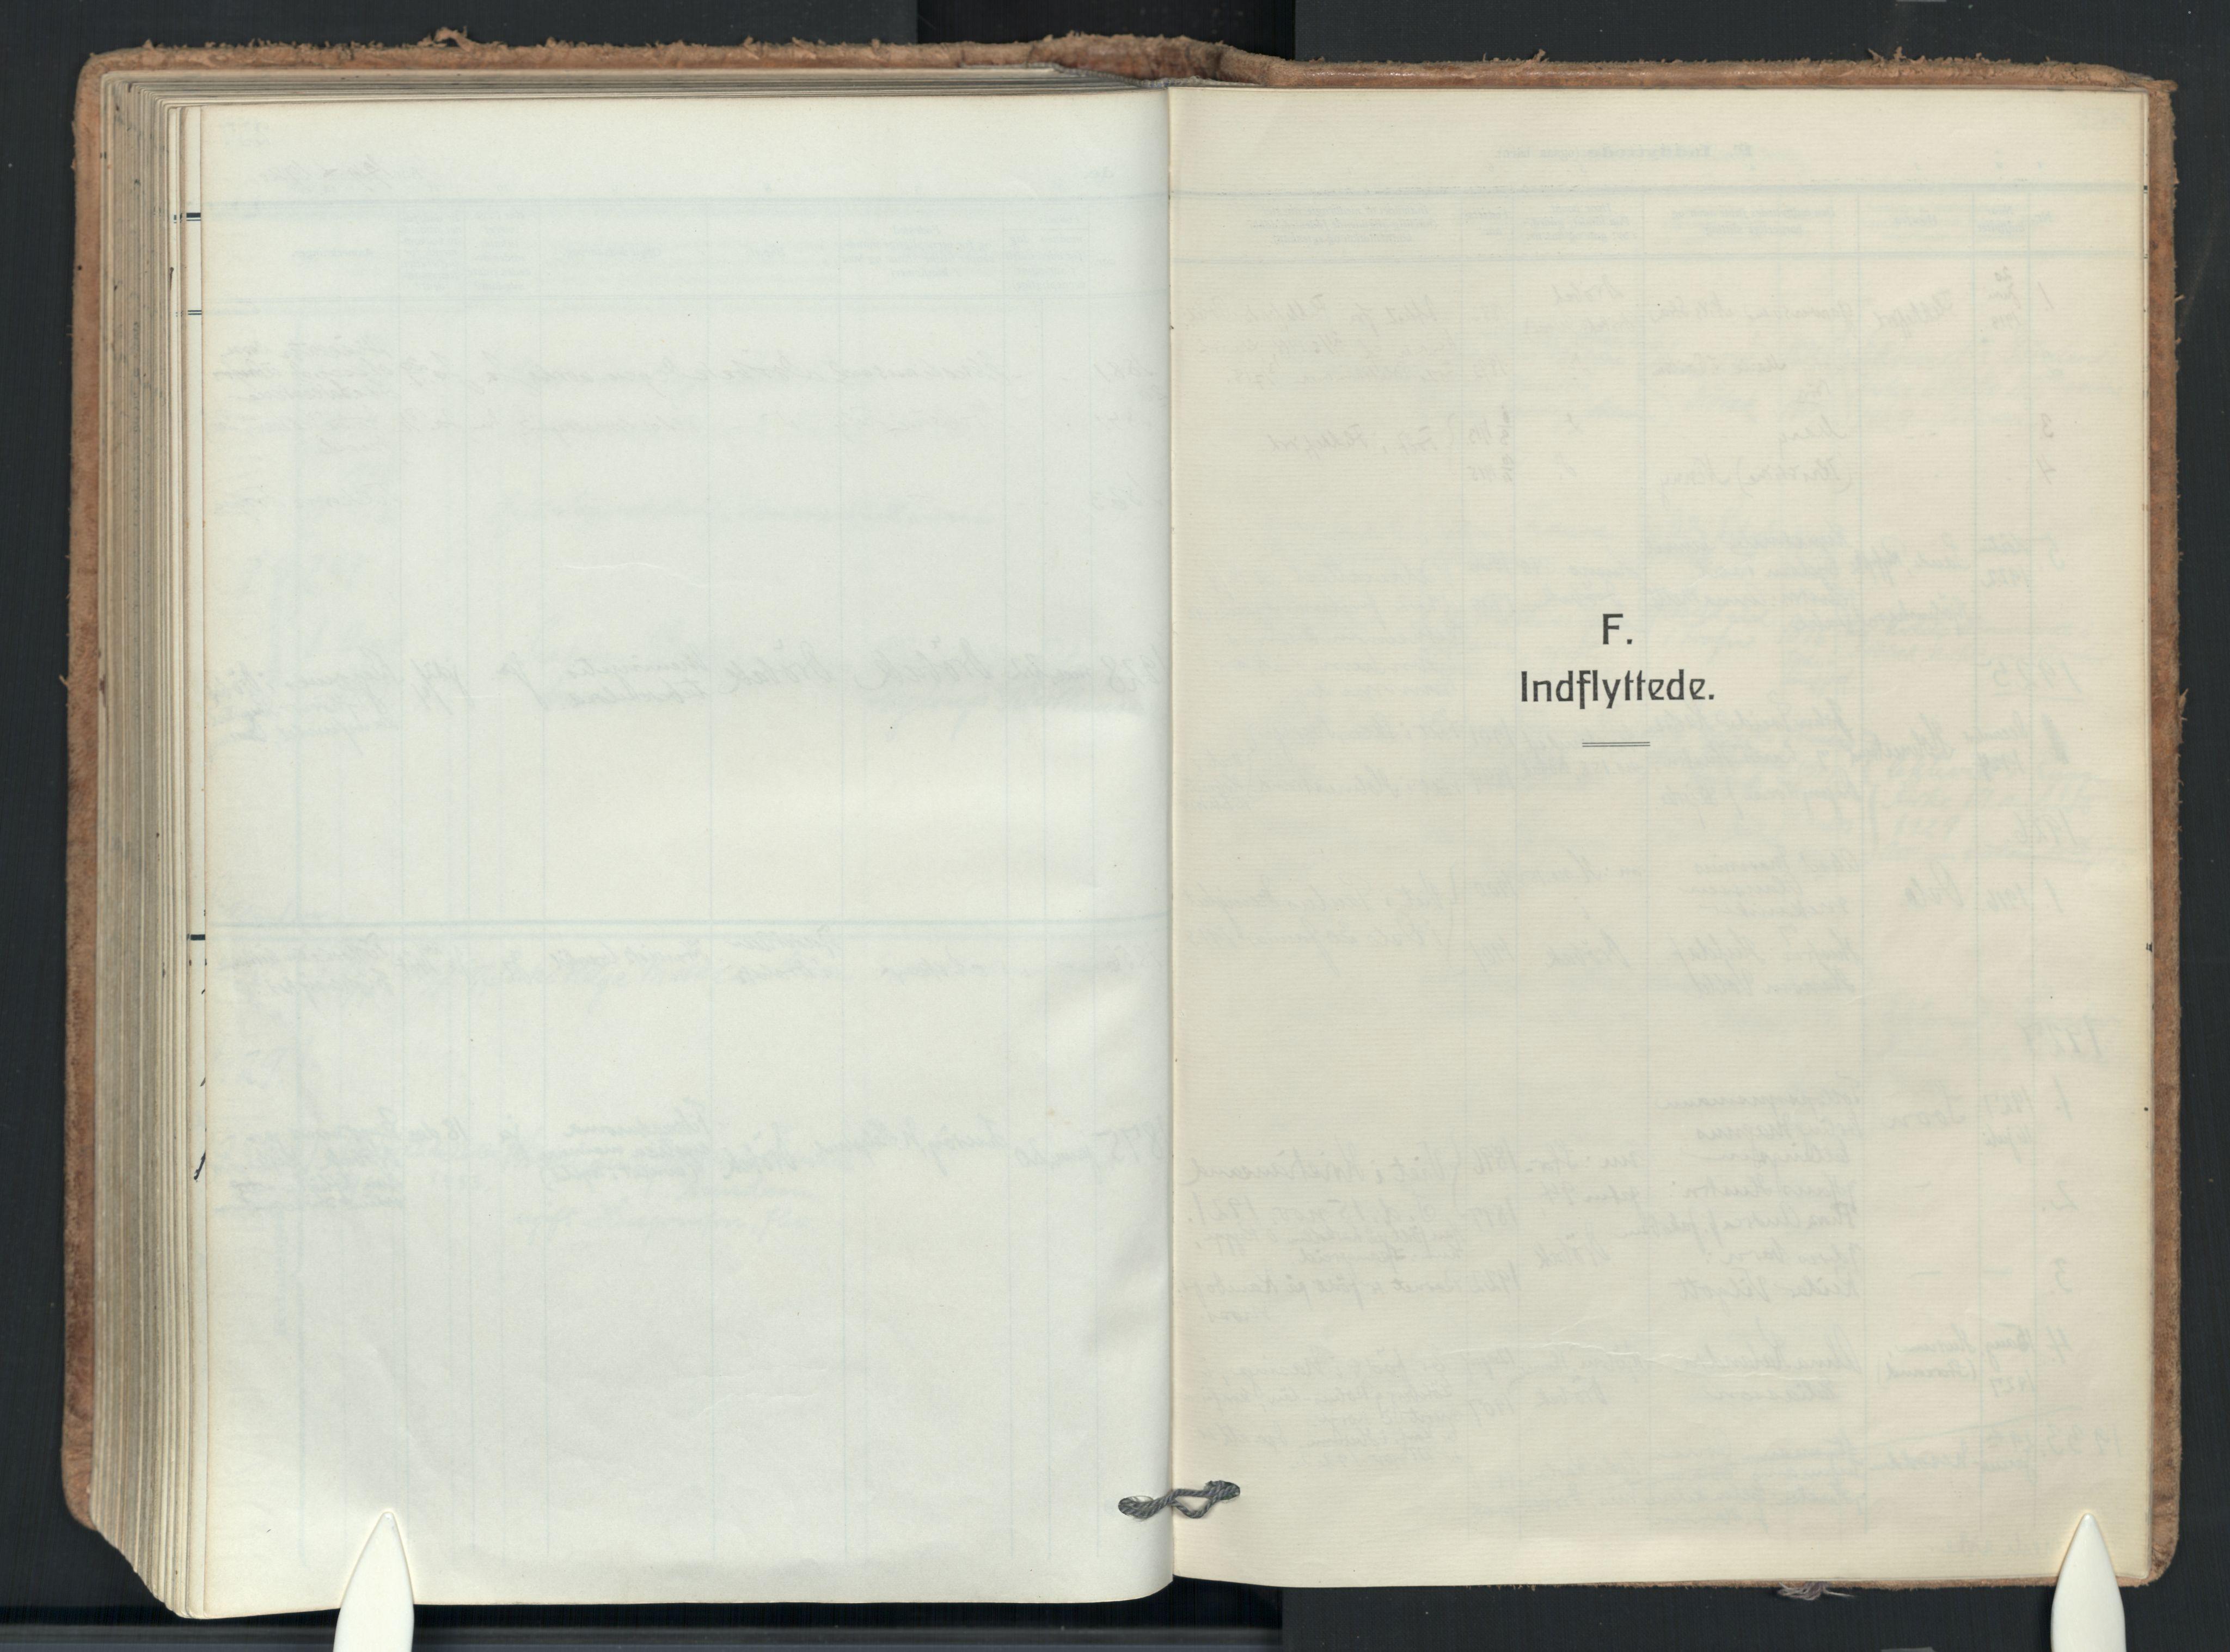 SAO, Drøbak prestekontor Kirkebøker, F/Fb/L0004: Ministerialbok nr. II 4, 1918-1933